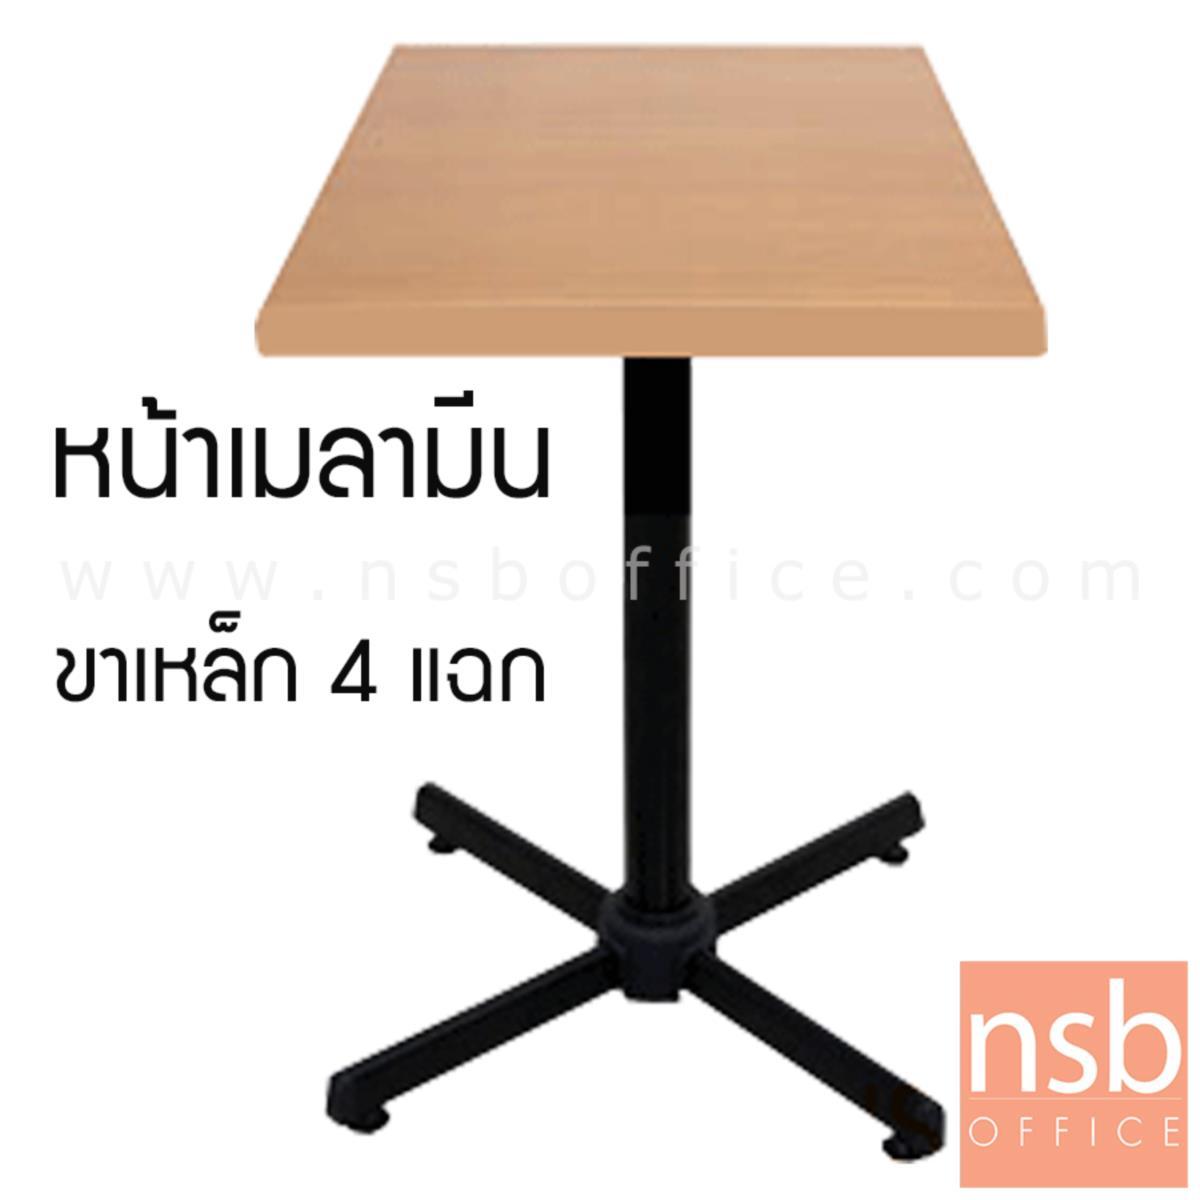 A07A039:โต๊ะหน้าเมลามีน 25 มม. รุ่น  Beaumont 2 (โบมอนต์ 2) ขนาด 60W ,75W ,60Di ,75Di cm.  ขาเหล็กฐาน 4 แฉกสีดำ